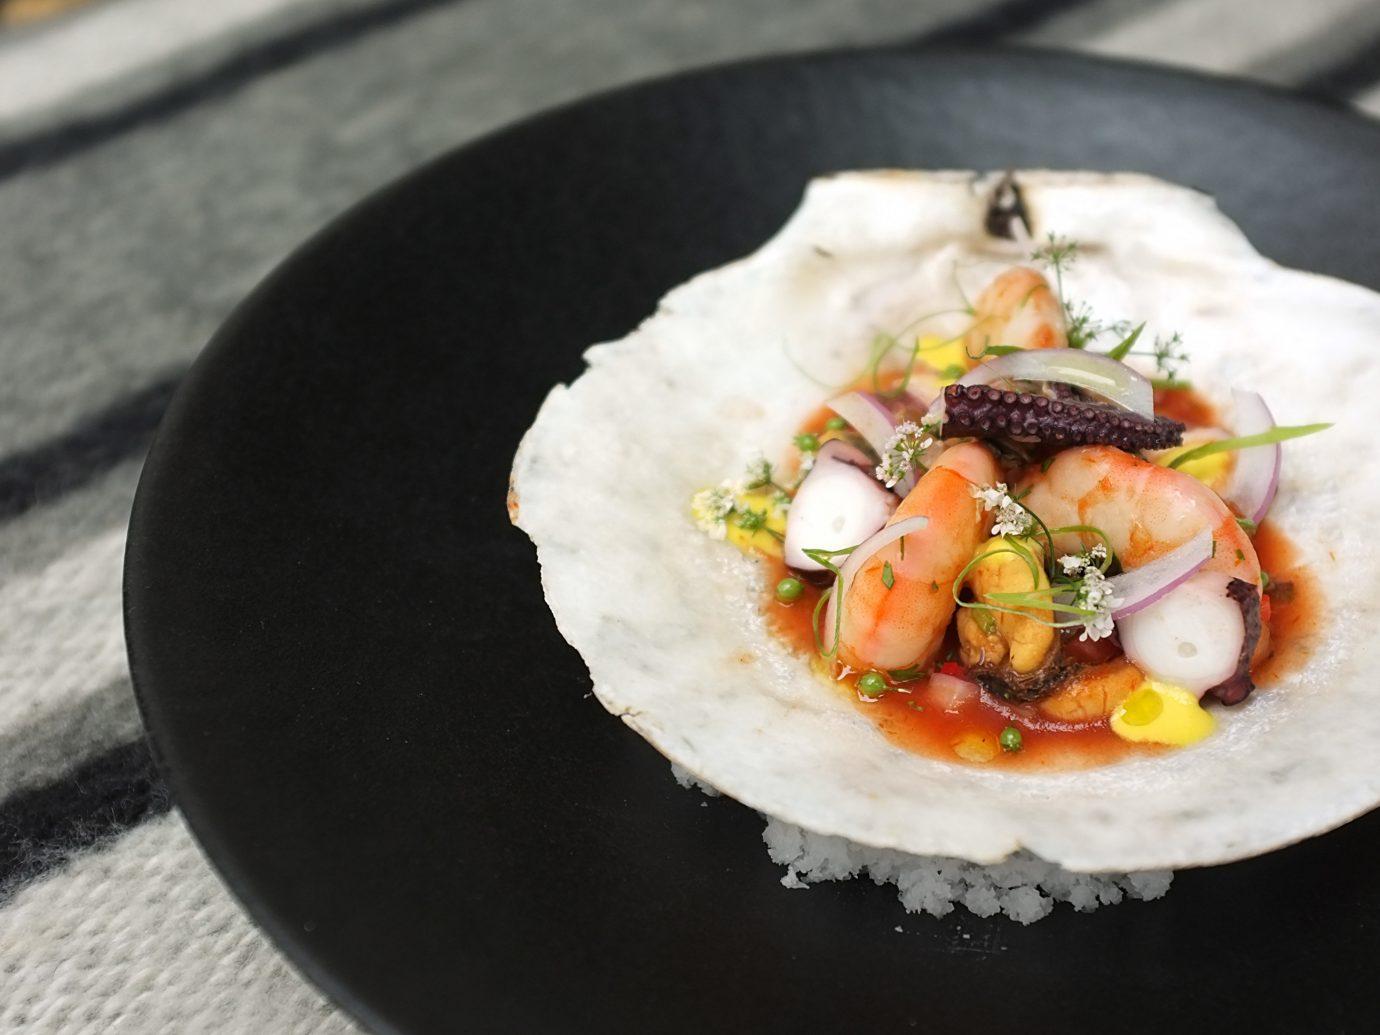 food dish plate indoor black sushi cuisine produce meal sense asian food breakfast Seafood